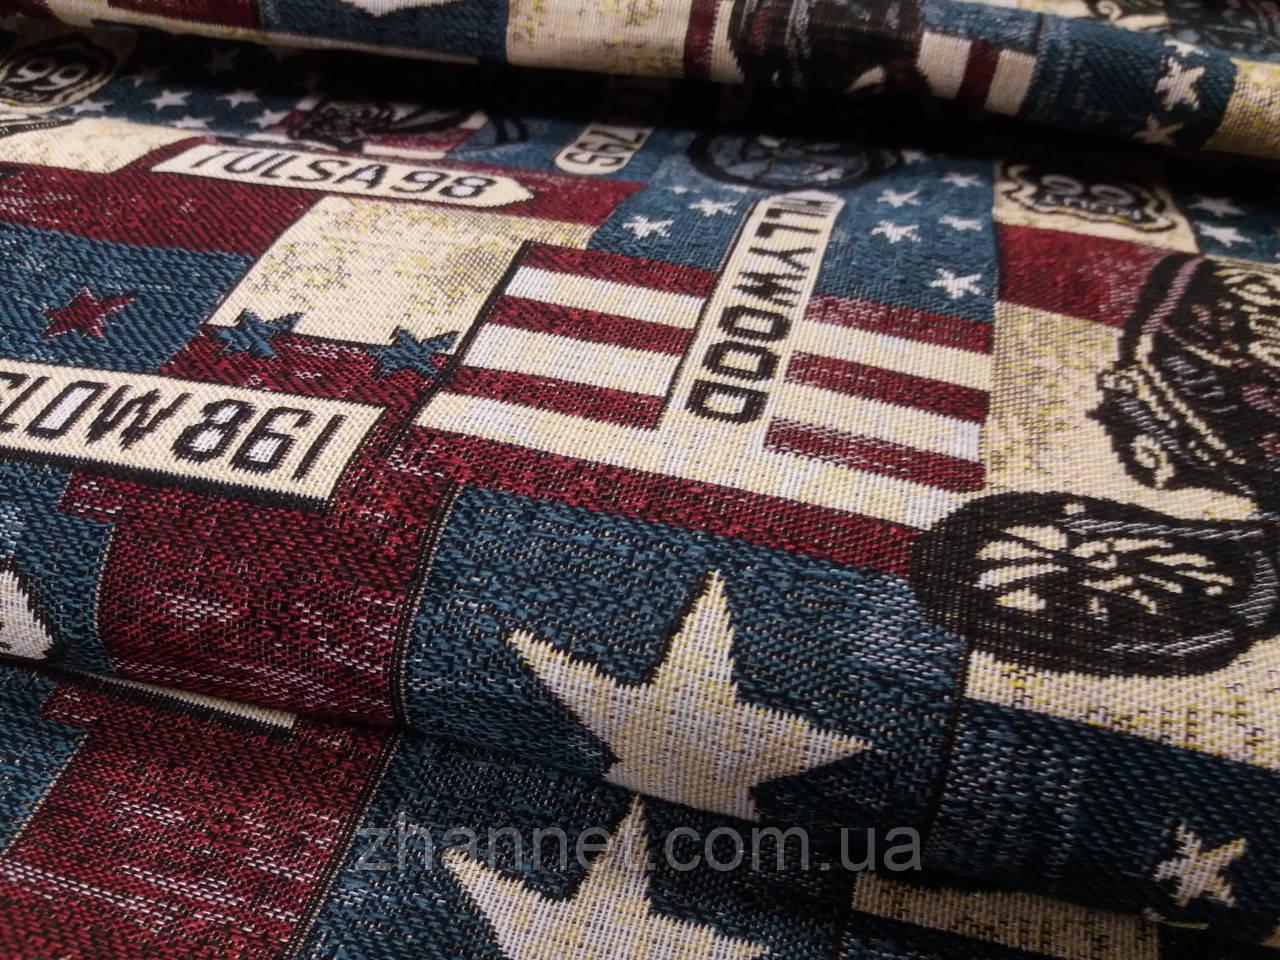 Ткань гобелен Rout 280 см (193941)